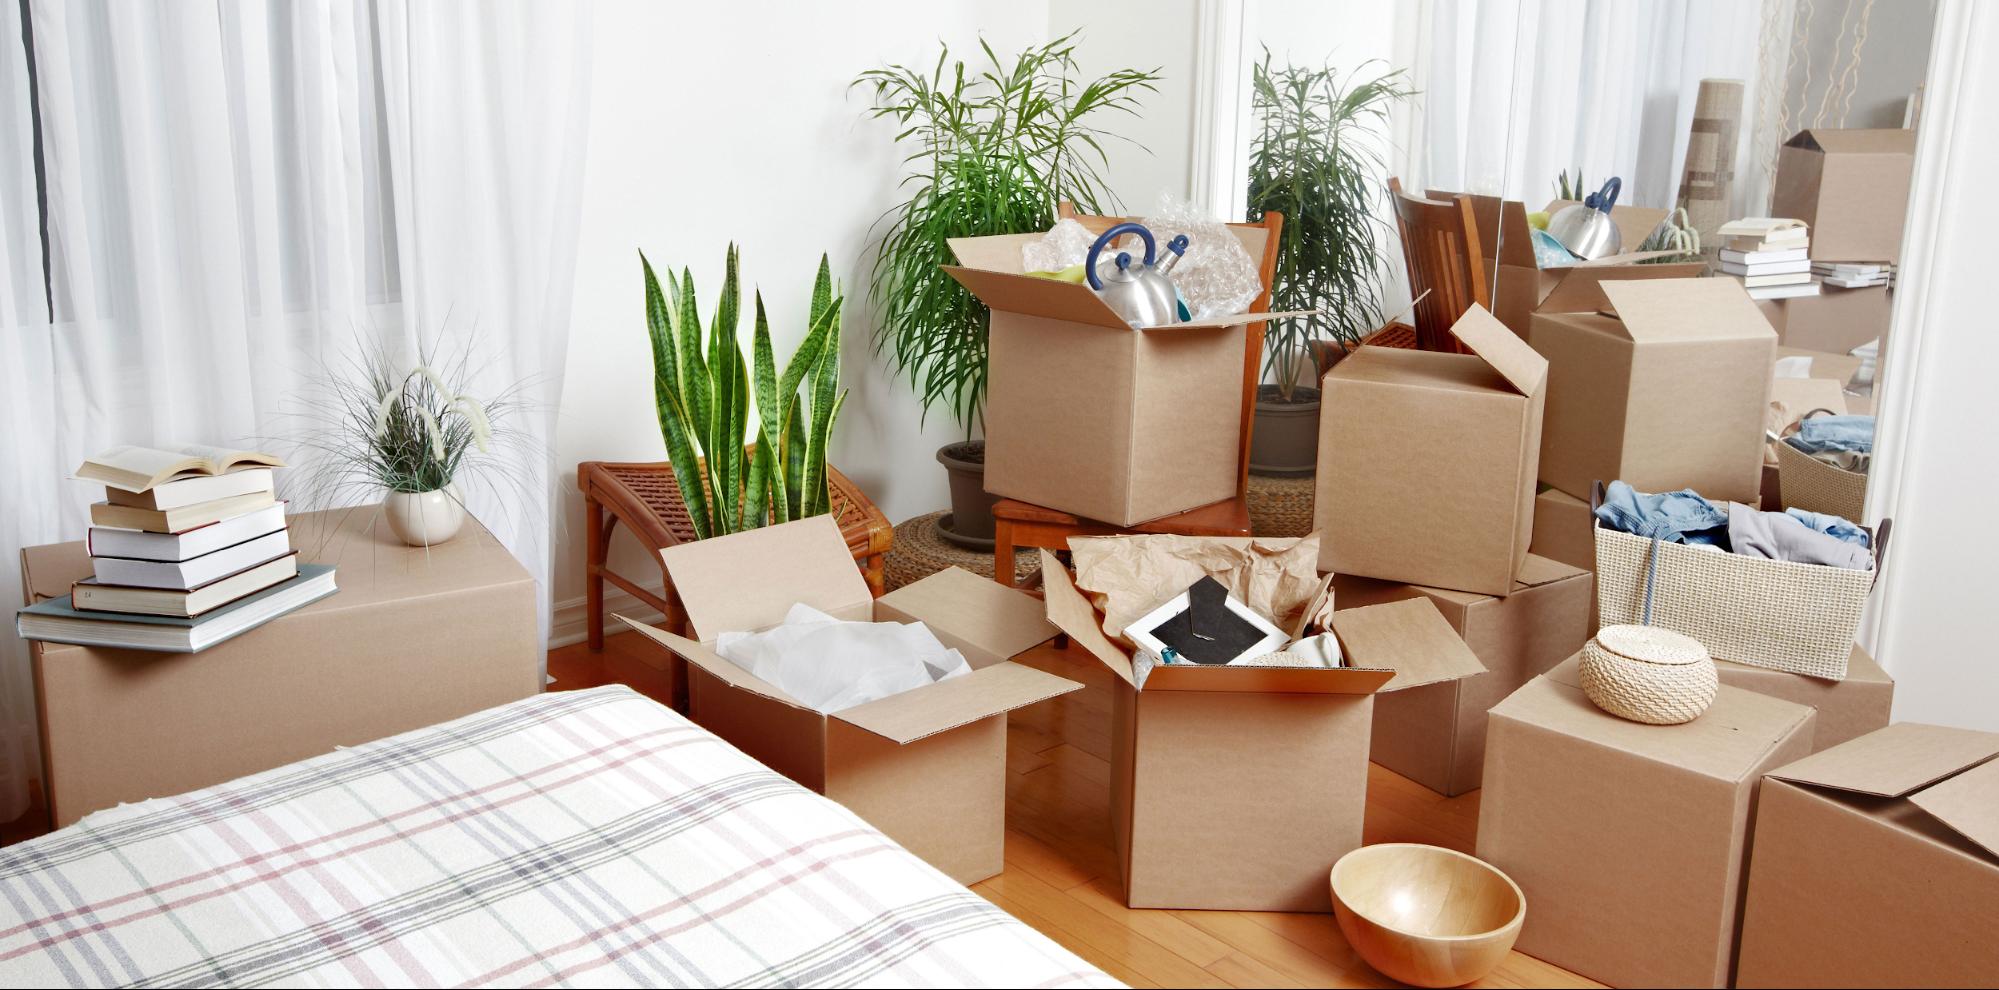 unpack one room